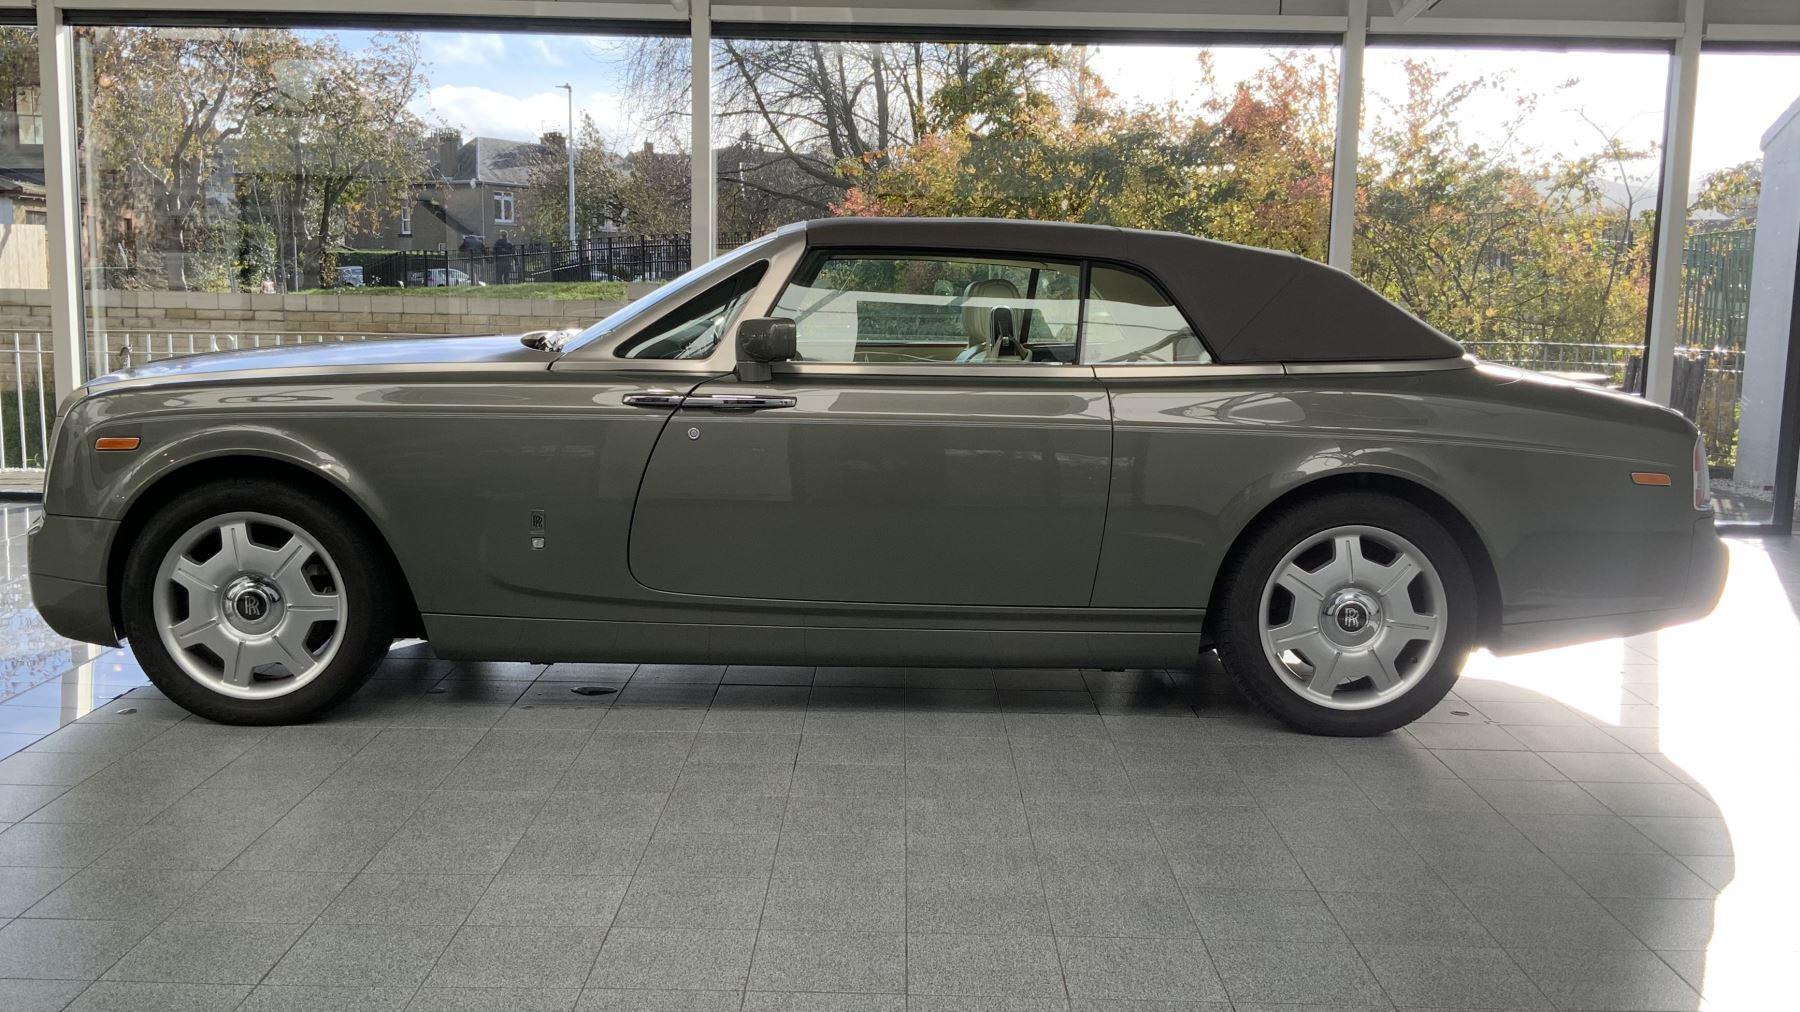 Rolls-Royce Phantom Drophead Coupe 2dr Auto image 9